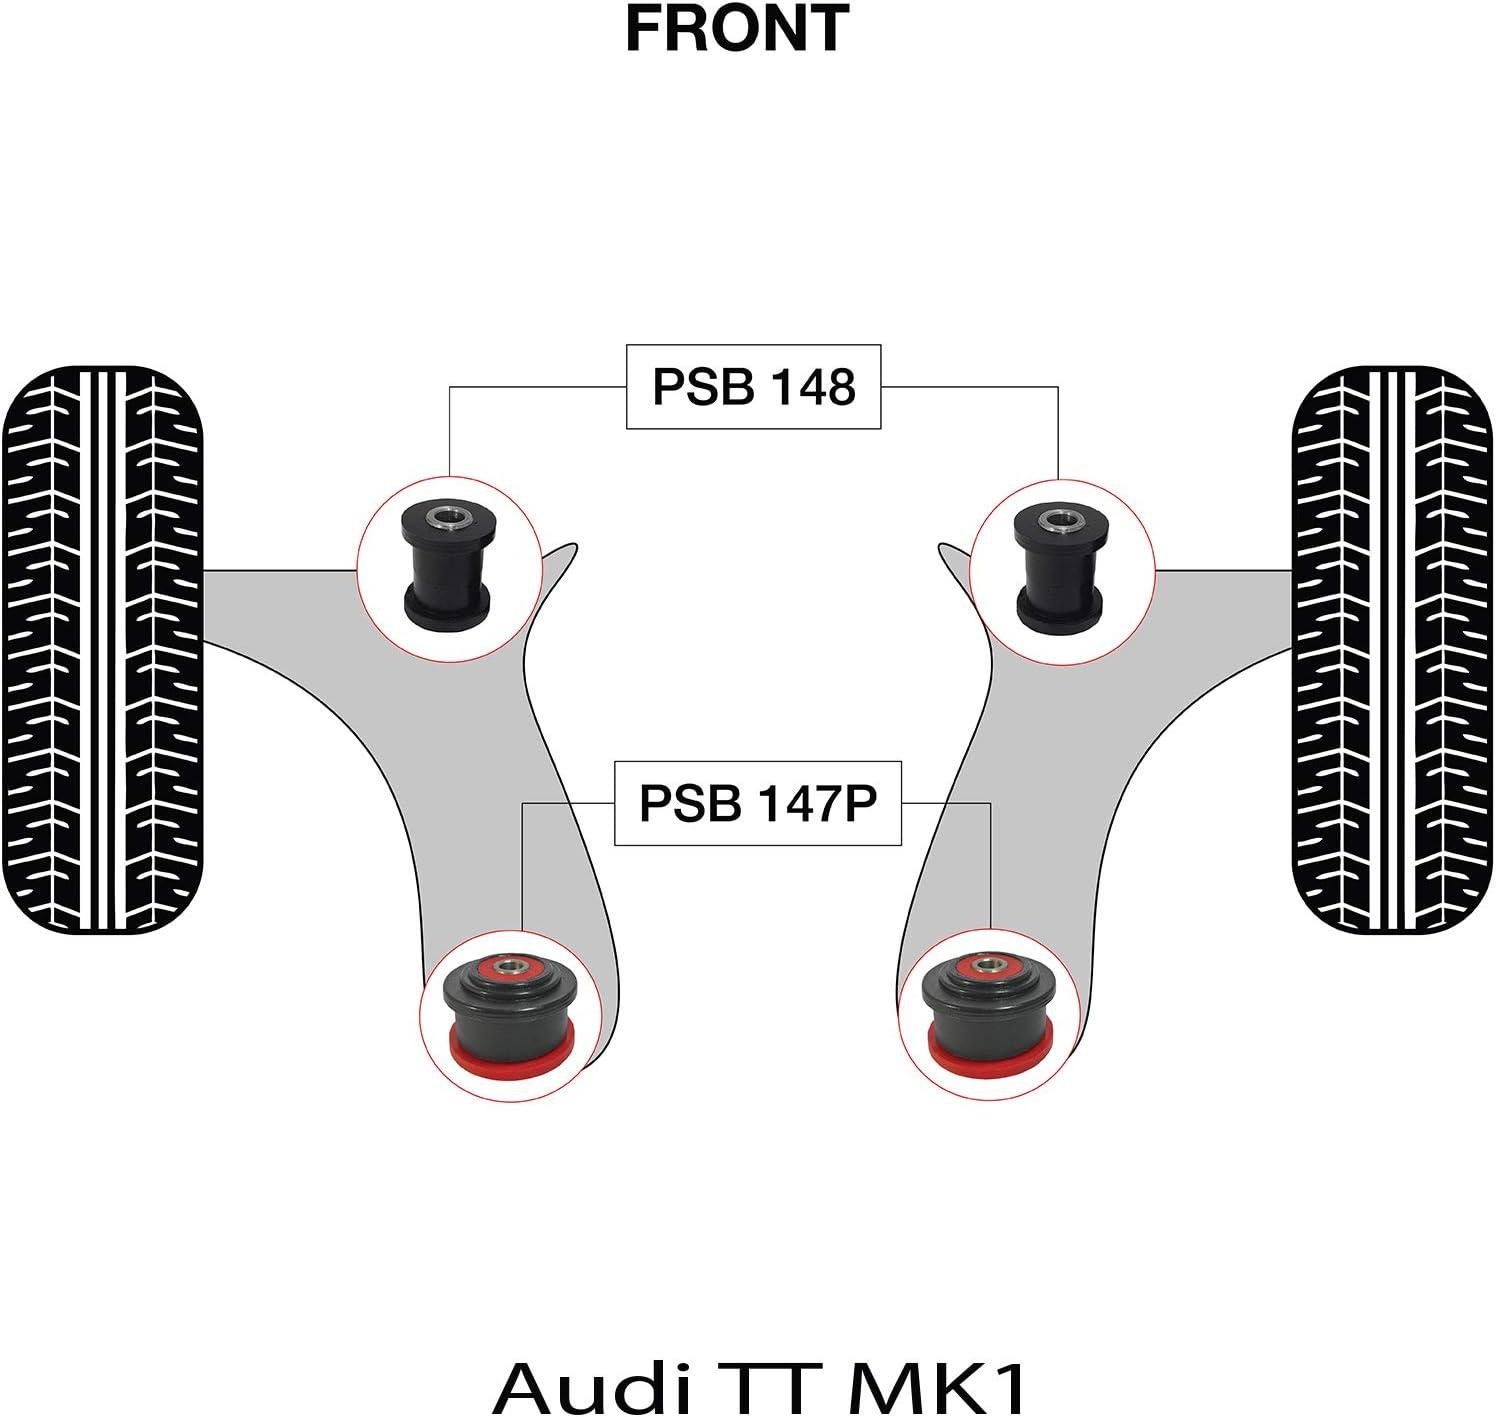 Bushing Kit PSB148//147P Complete Front Wishbone Pressed Arm PSB Polyurethane Bush TT MK1 98-06 30mm OD